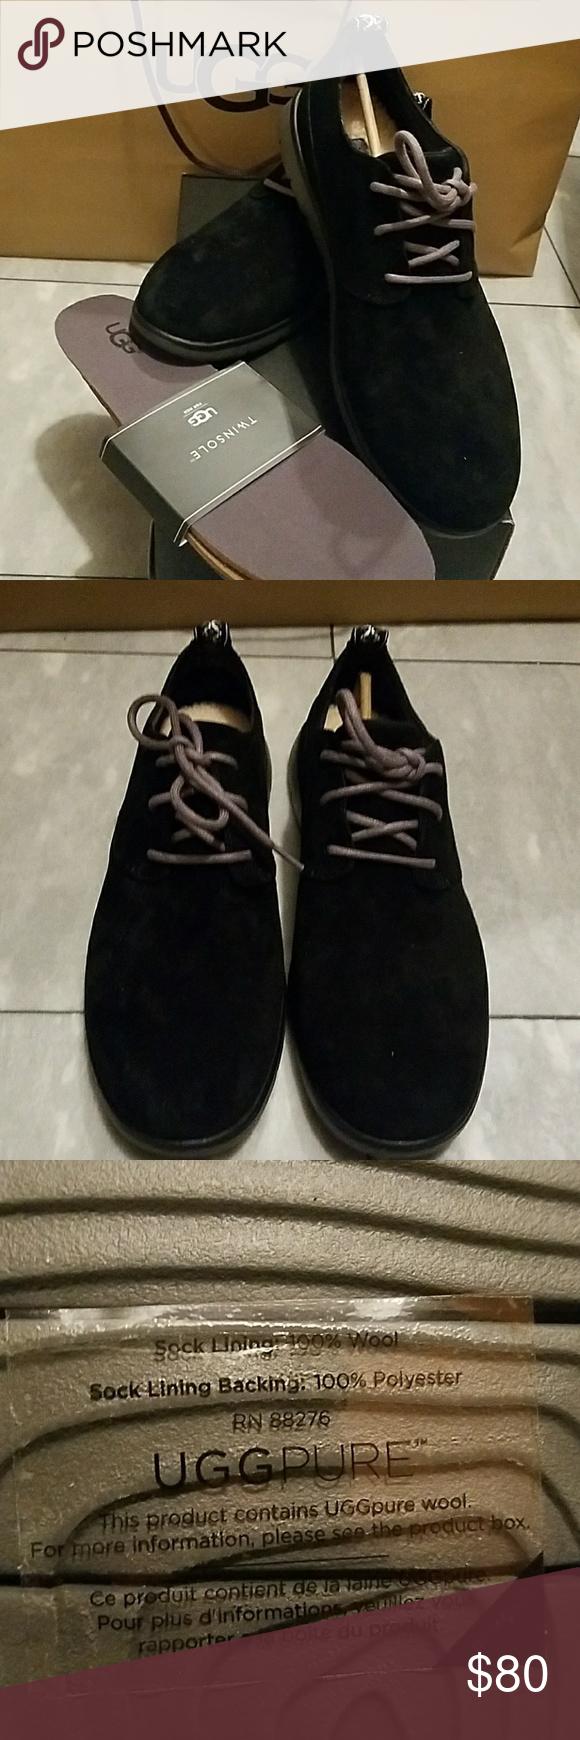 e4aba928f4e UGG Bowmore shoes men Brand new with box UGG Shoes | My Posh Picks ...